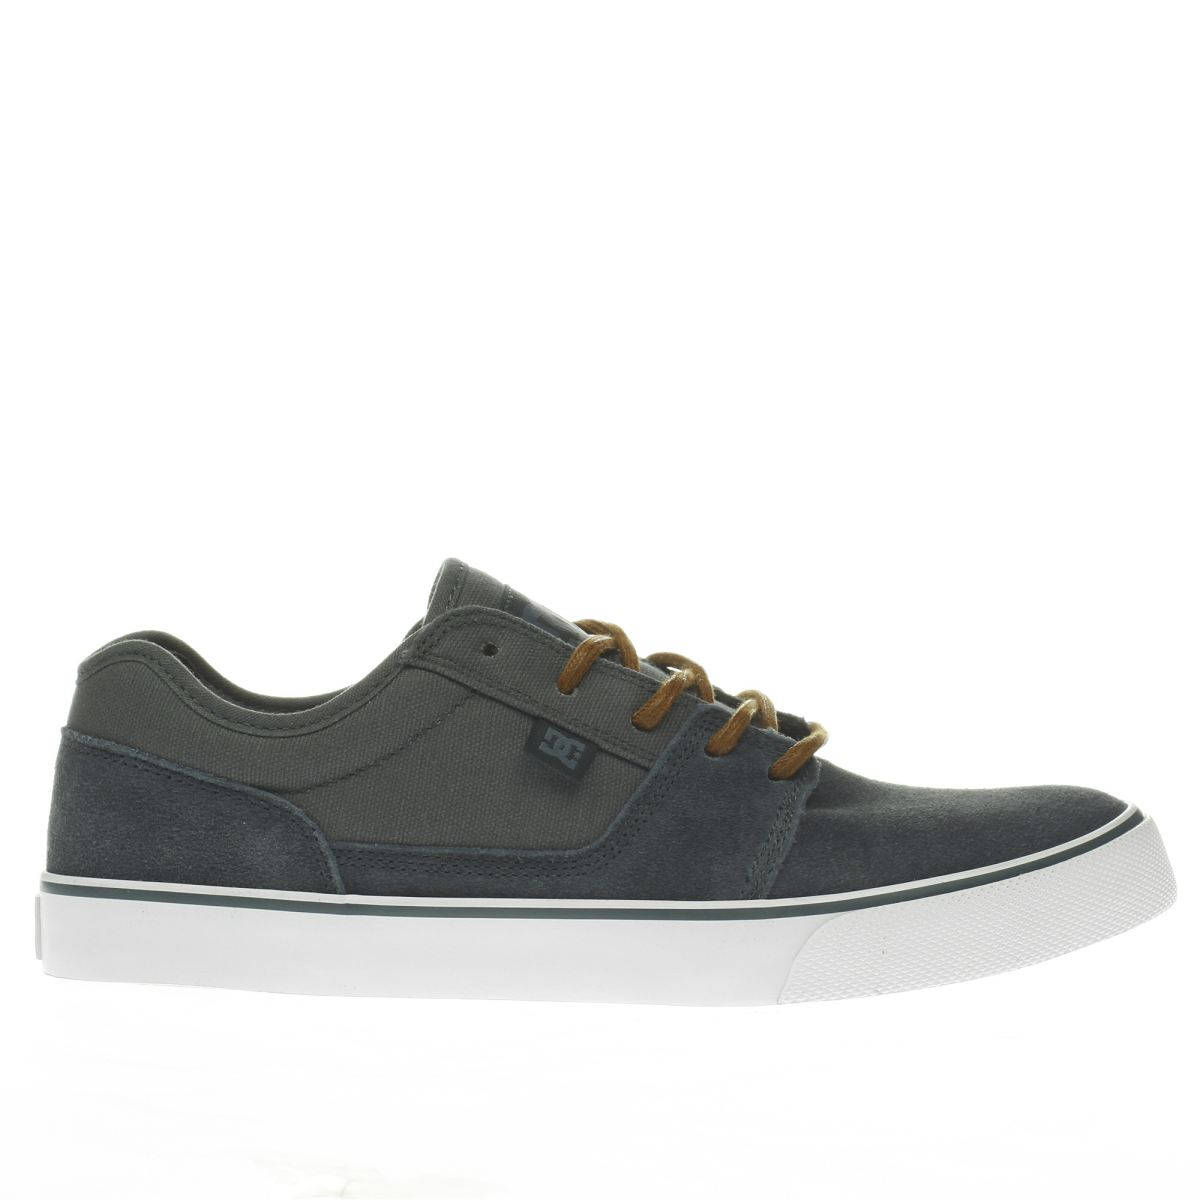 dc shoes Dc Shoes Dark Green Tonik Trainers